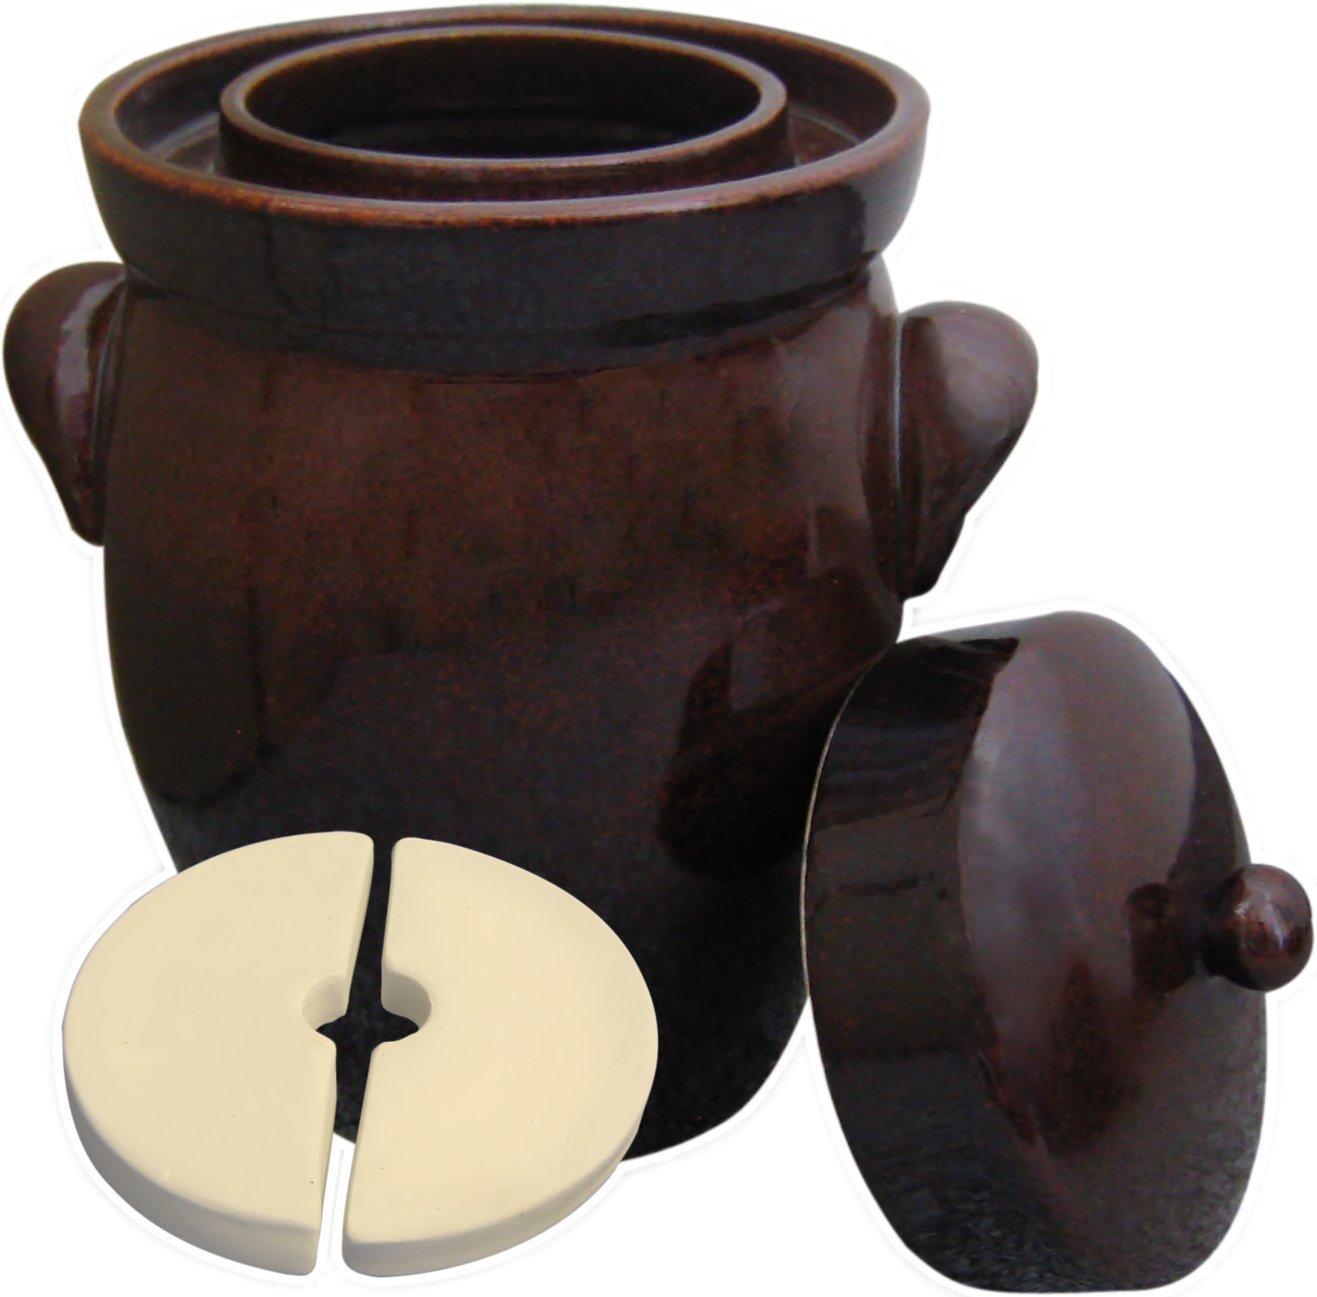 5L (1.3 Gal) K& K Keramik German Made Fermenting Crock Pot , Kerazo F2 COMINHKR099130